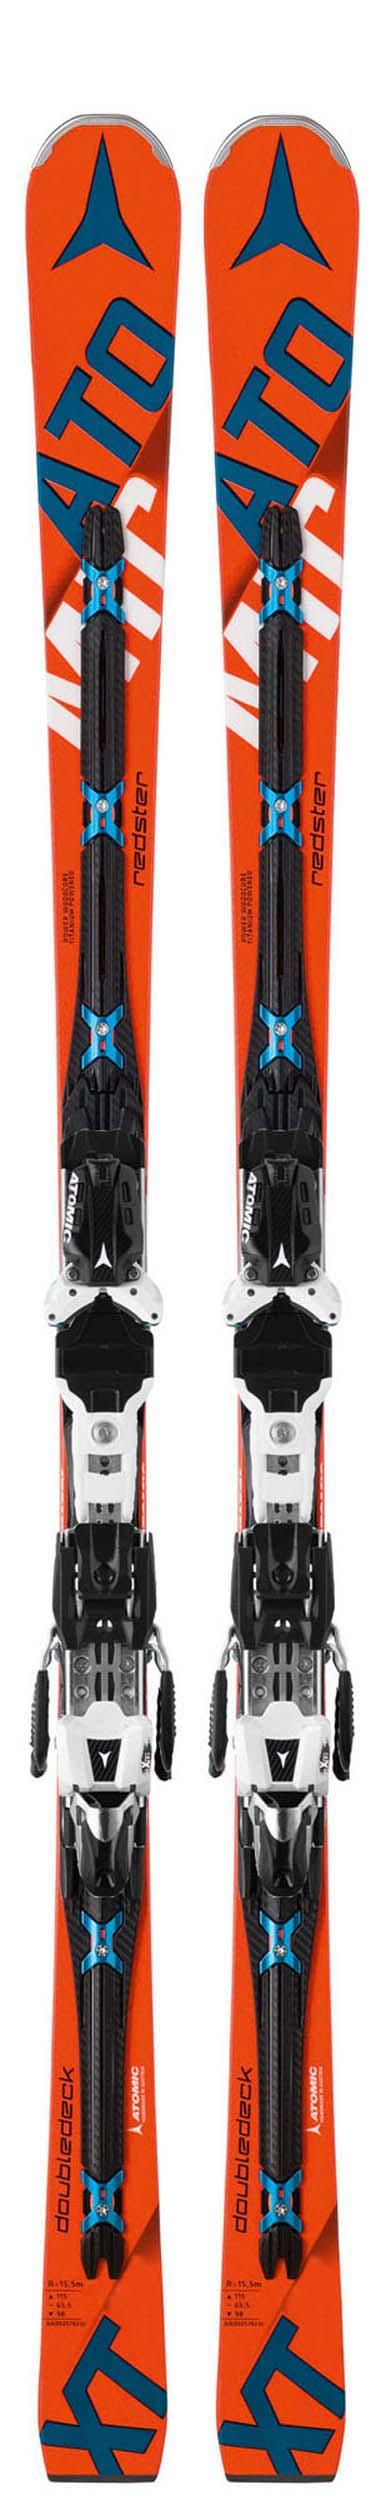 Atomic 2017 Redster D2 3.0 XT Skis w/TL 12 Bindings NEW !! 182cm